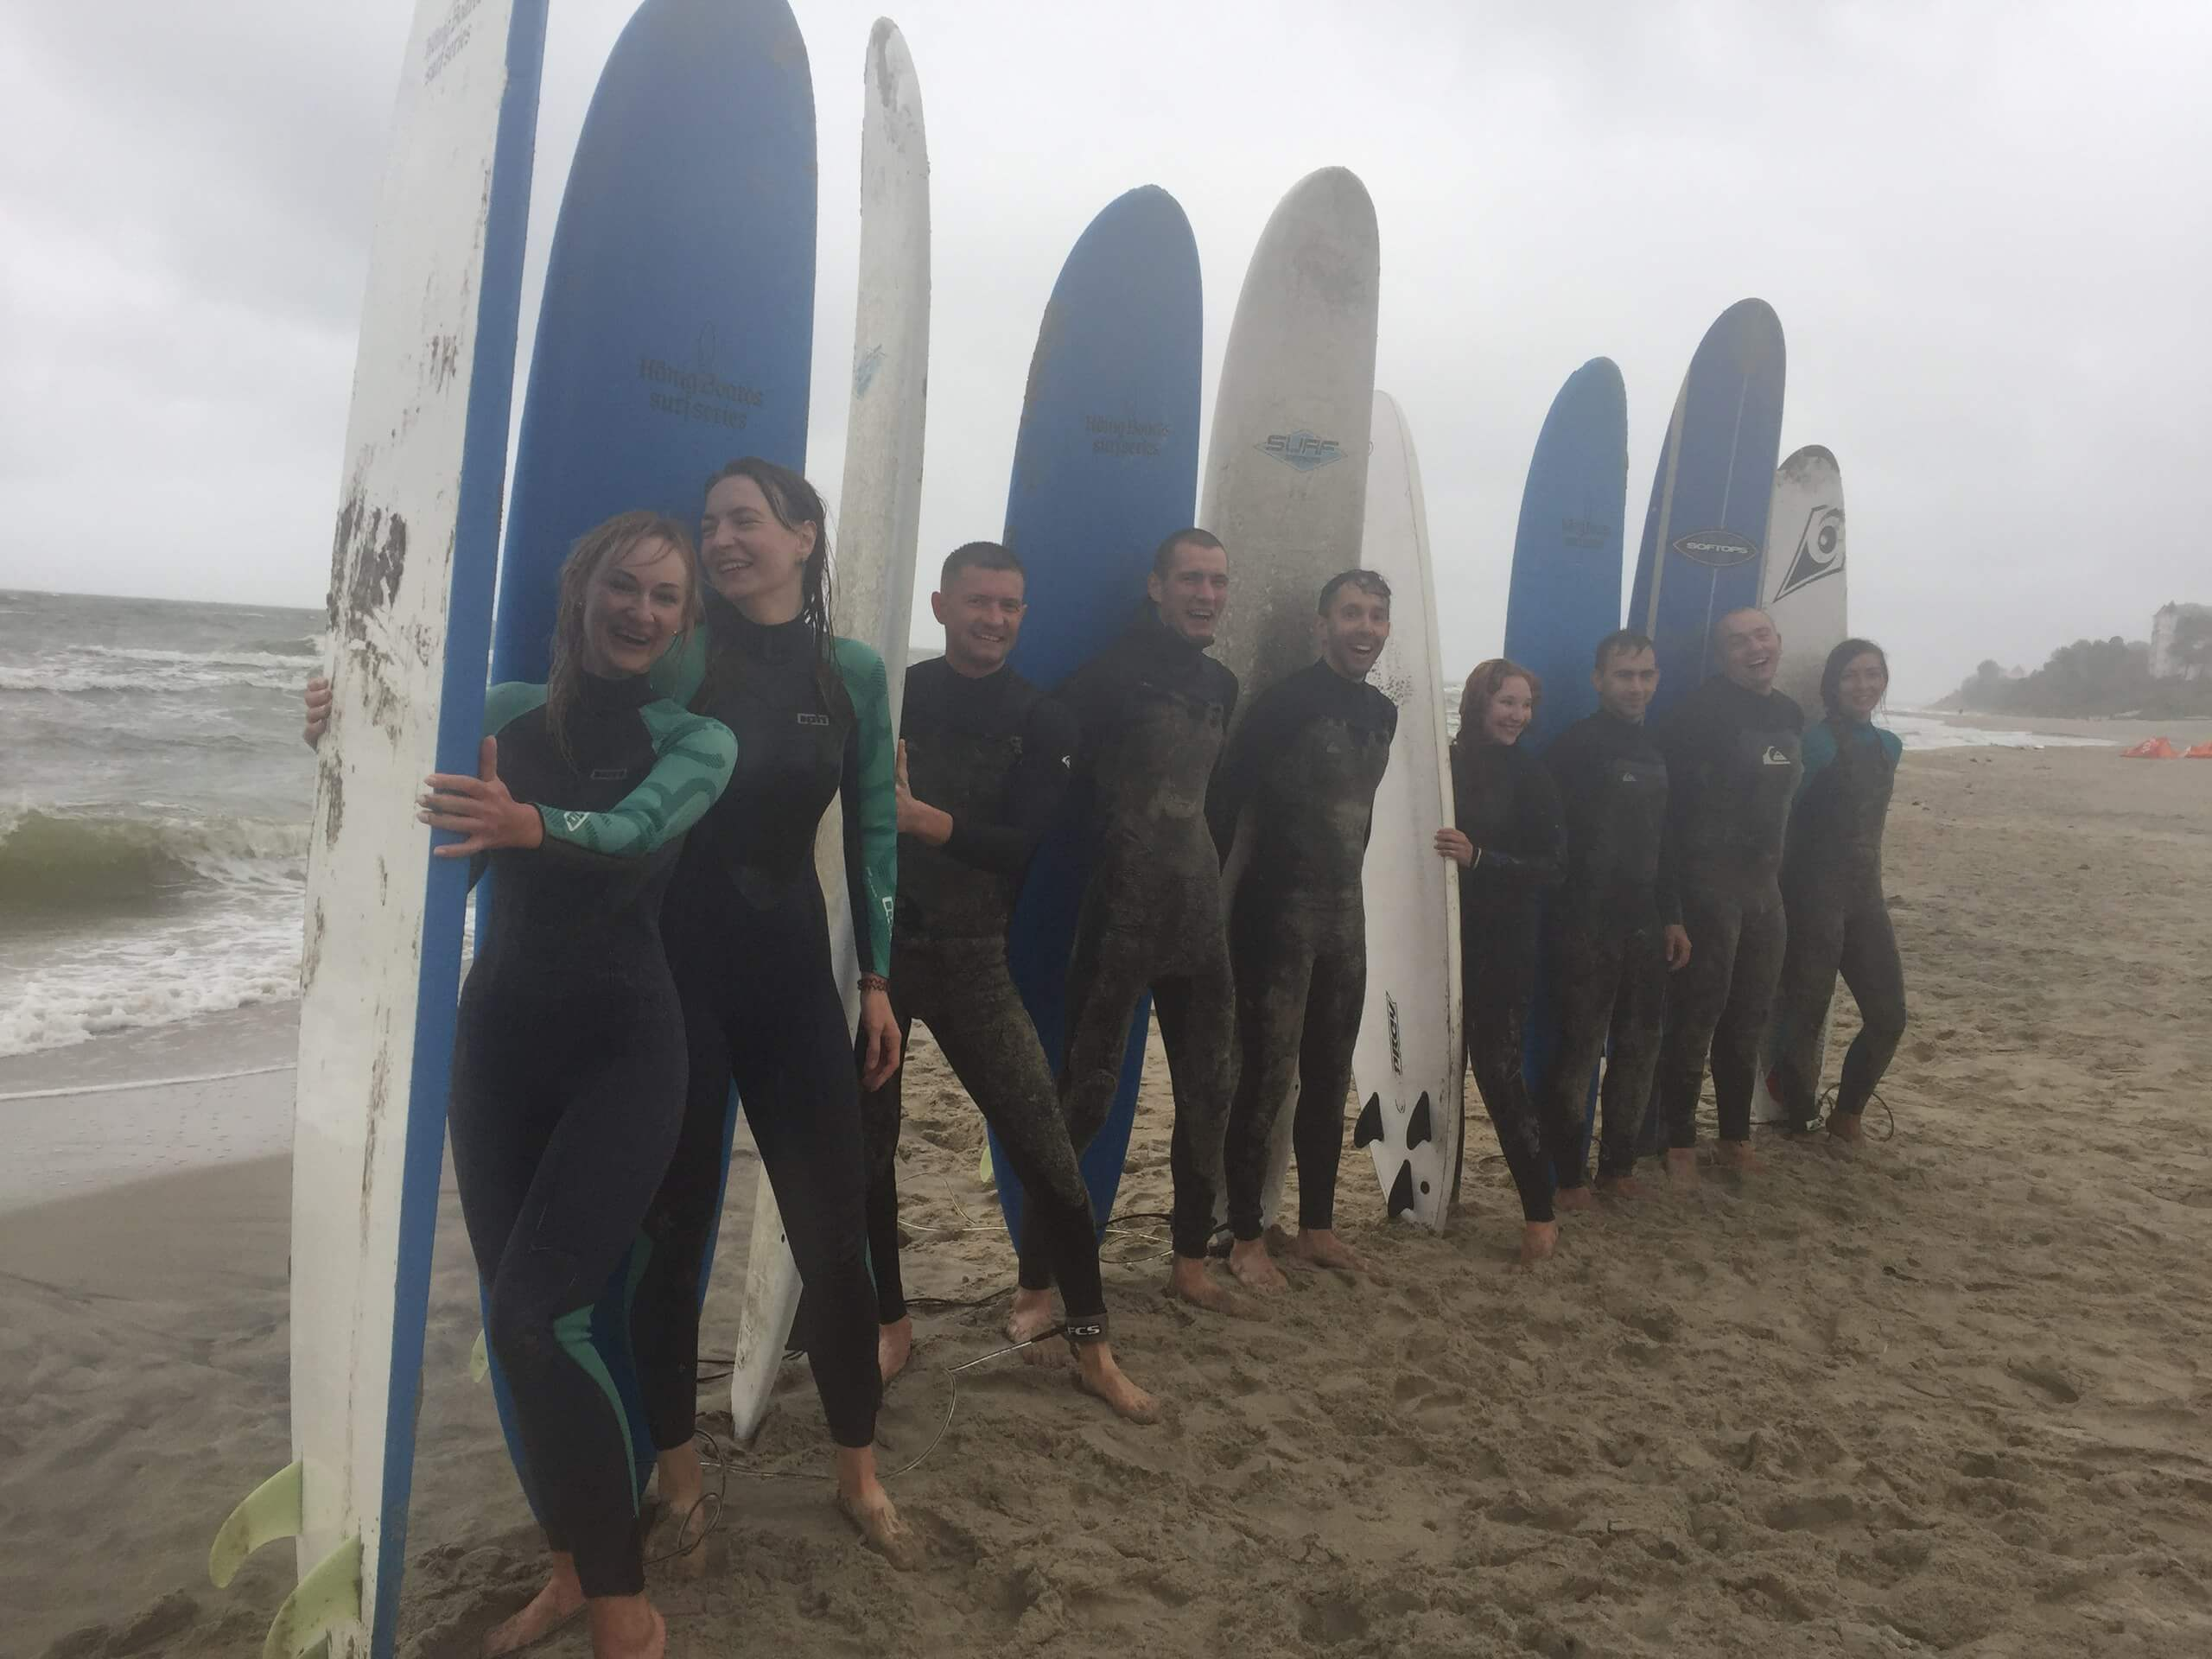 проект на грани на серфинге в балтийском море калининград